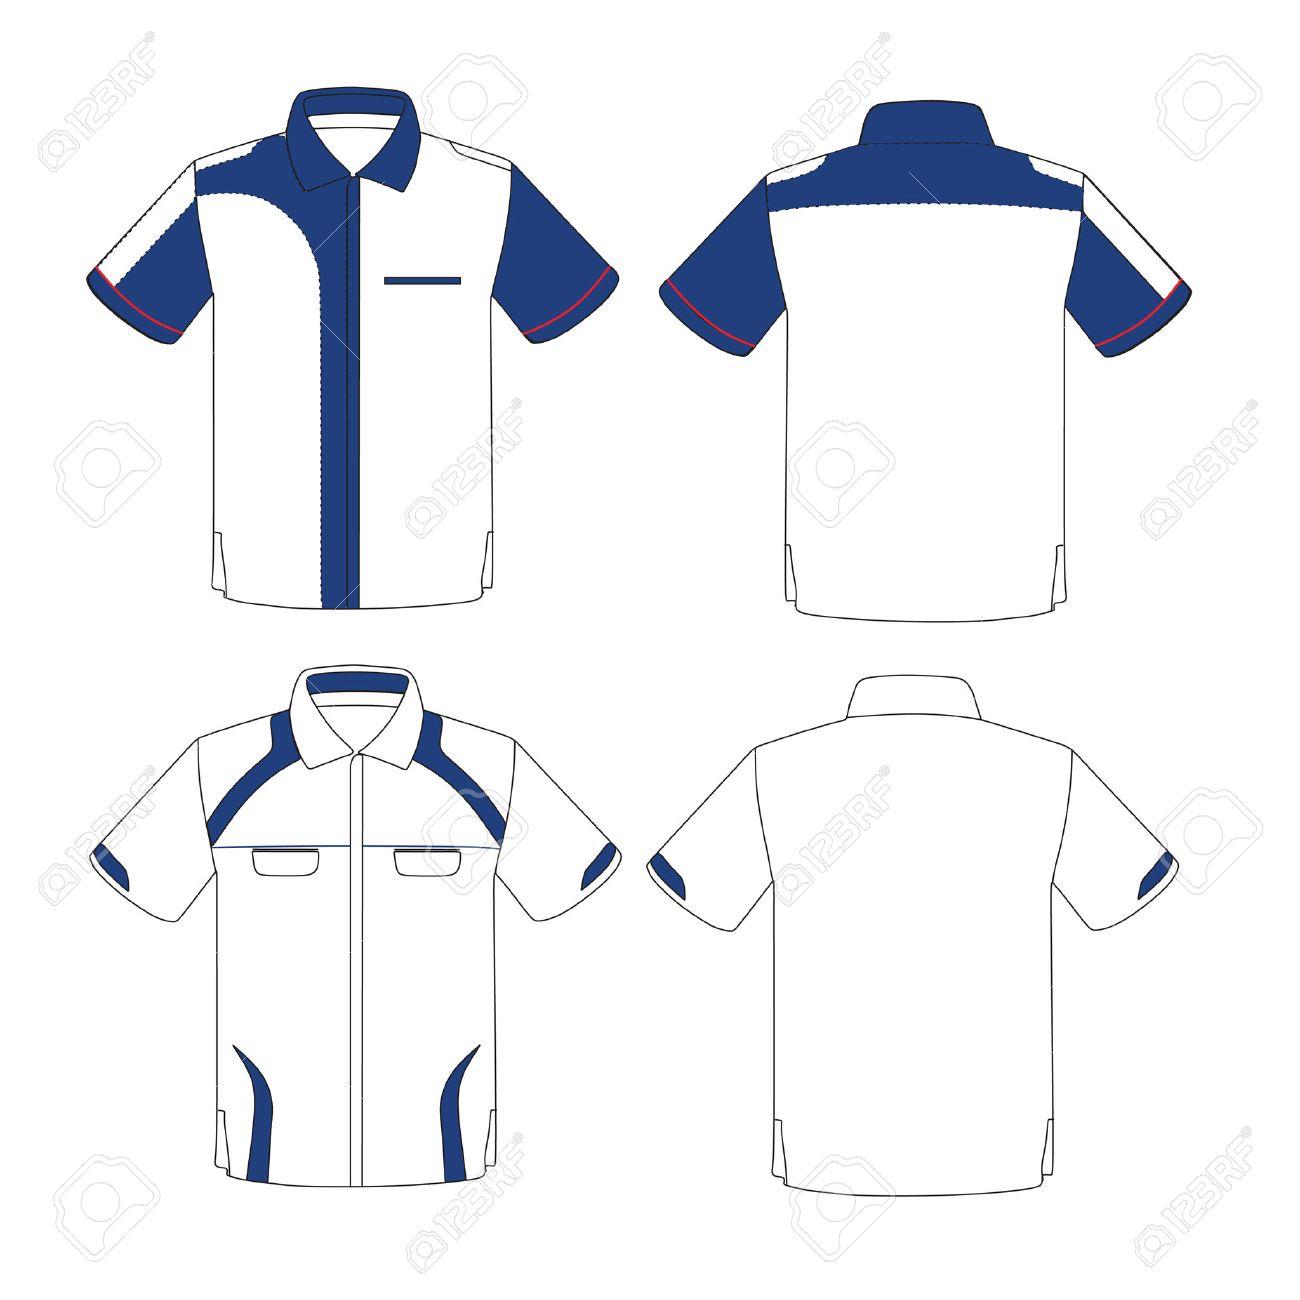 Shirt uniform design vector - Uniform Design Template Vector Stock Vector 44742747